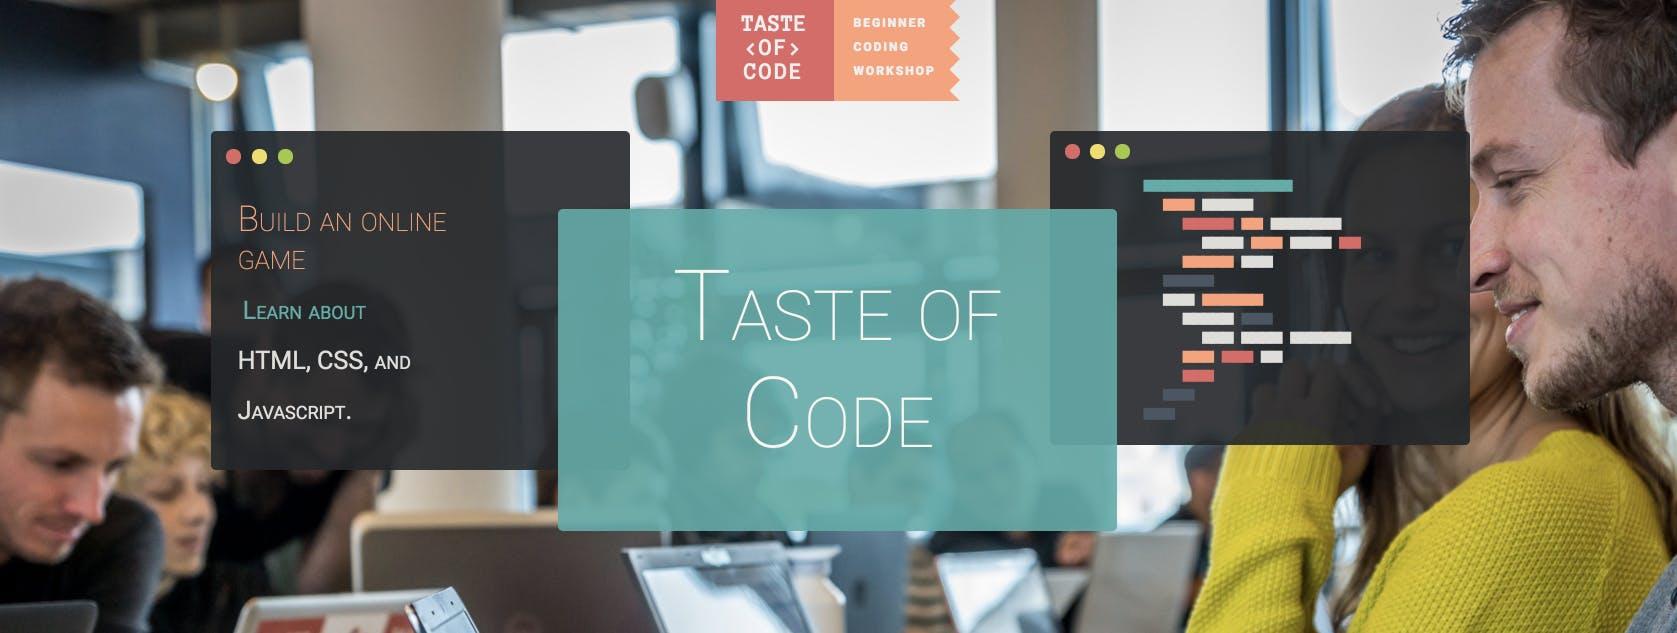 Taste of Code at Codaisseur